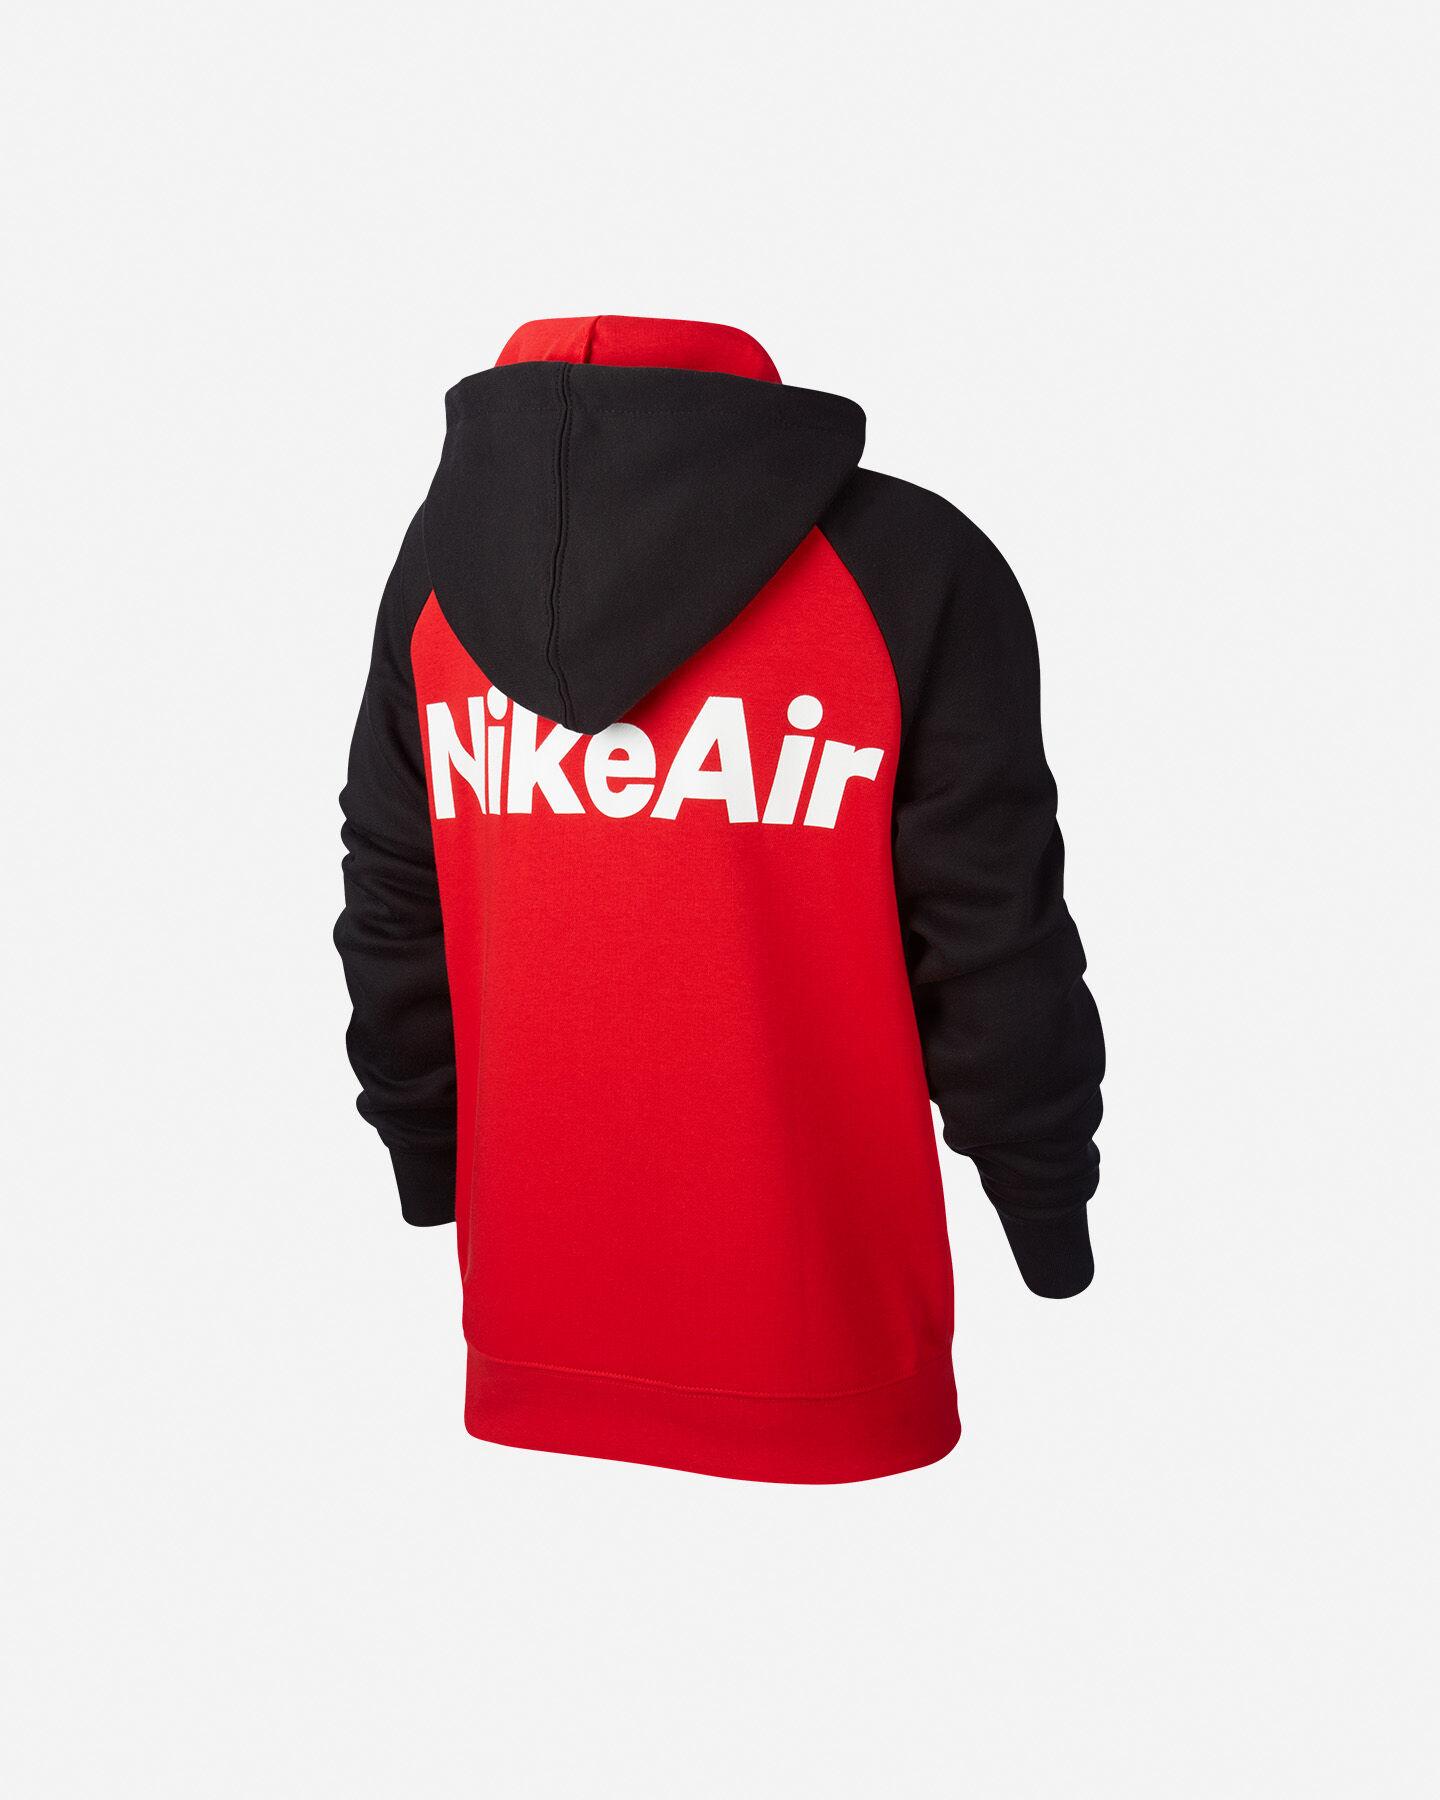 Felpa NIKE AIR COLOR BLOCK JR S5164583 scatto 1